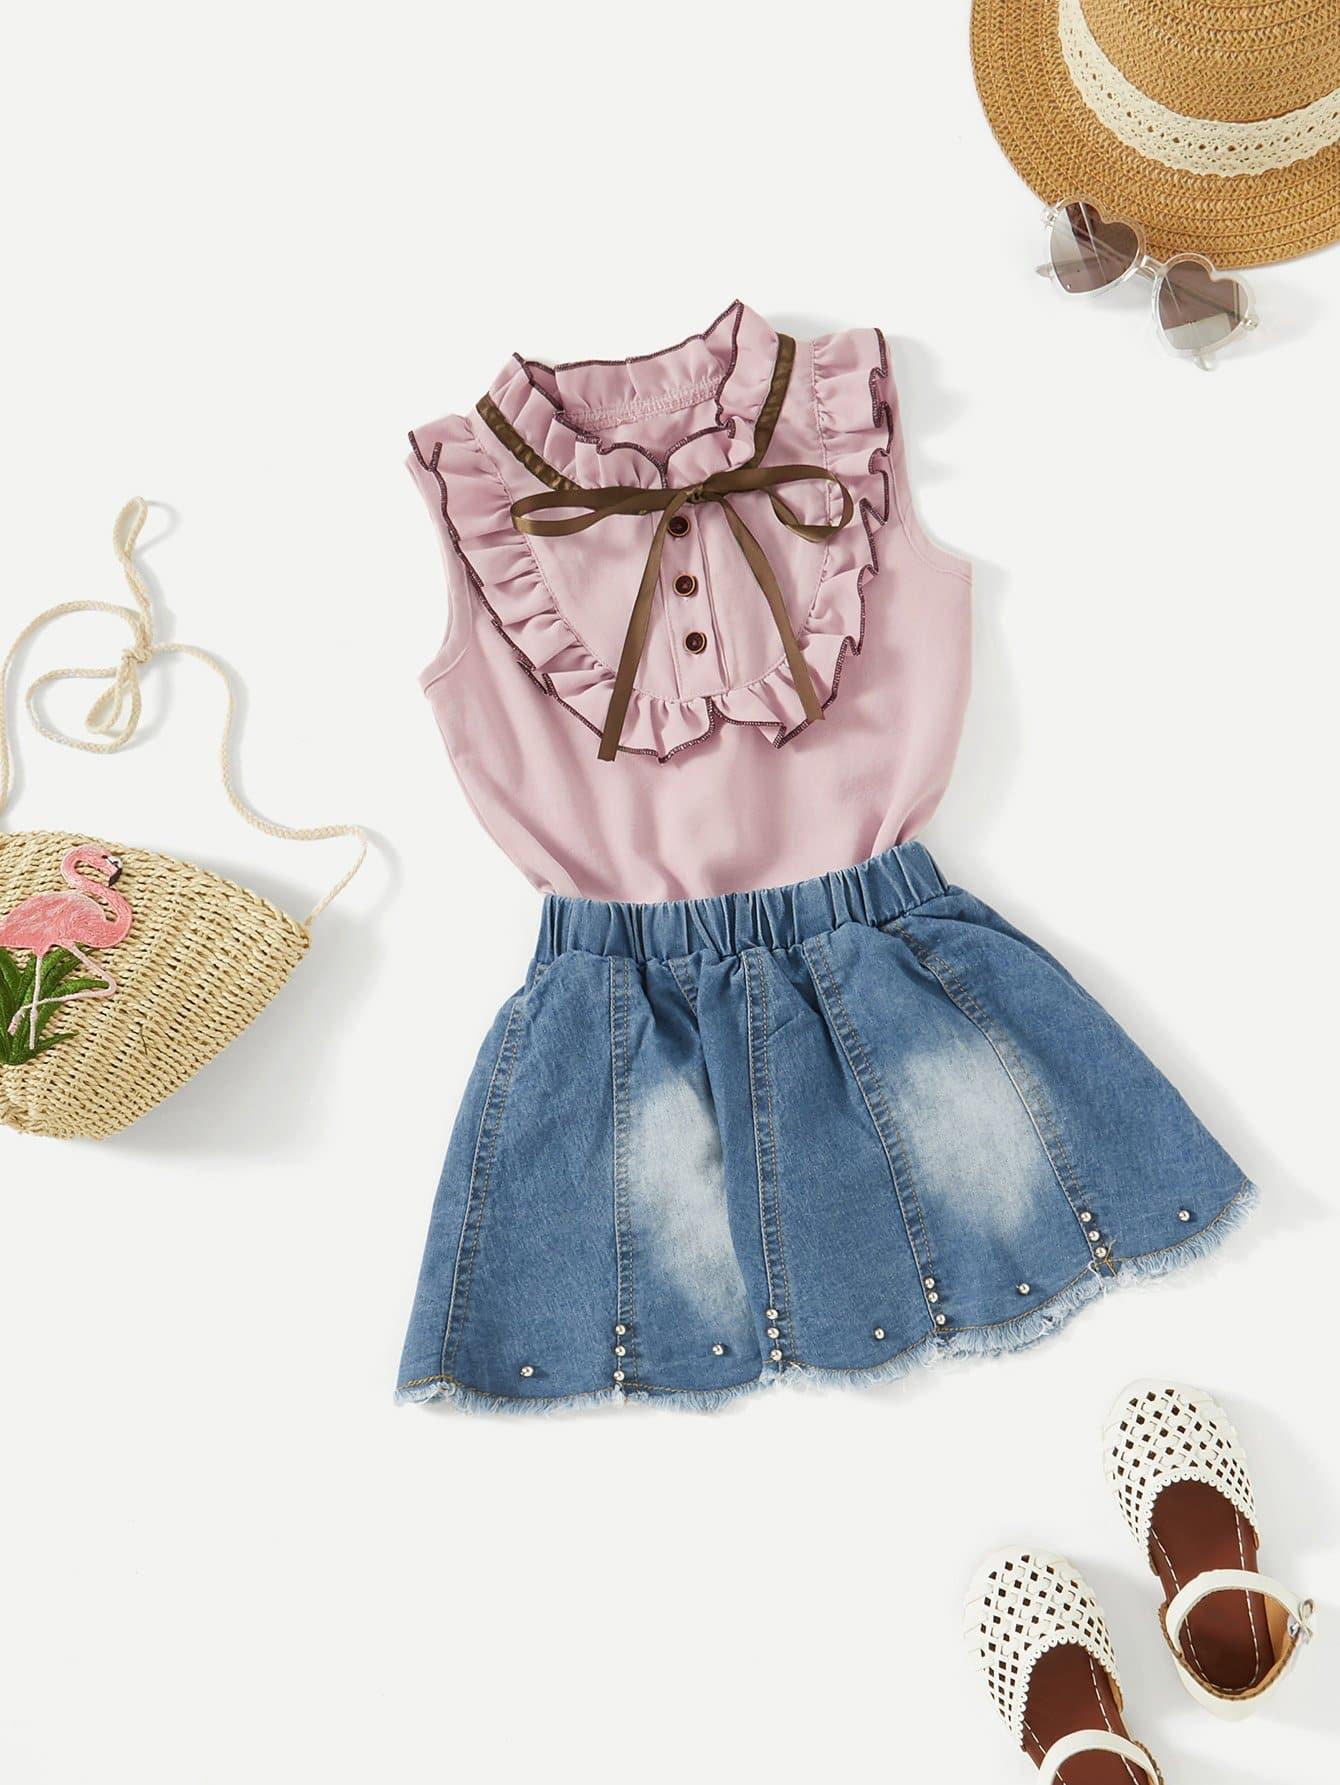 Frill Trim Blouse With Denim Skirt frill trim blouse with denim skirt